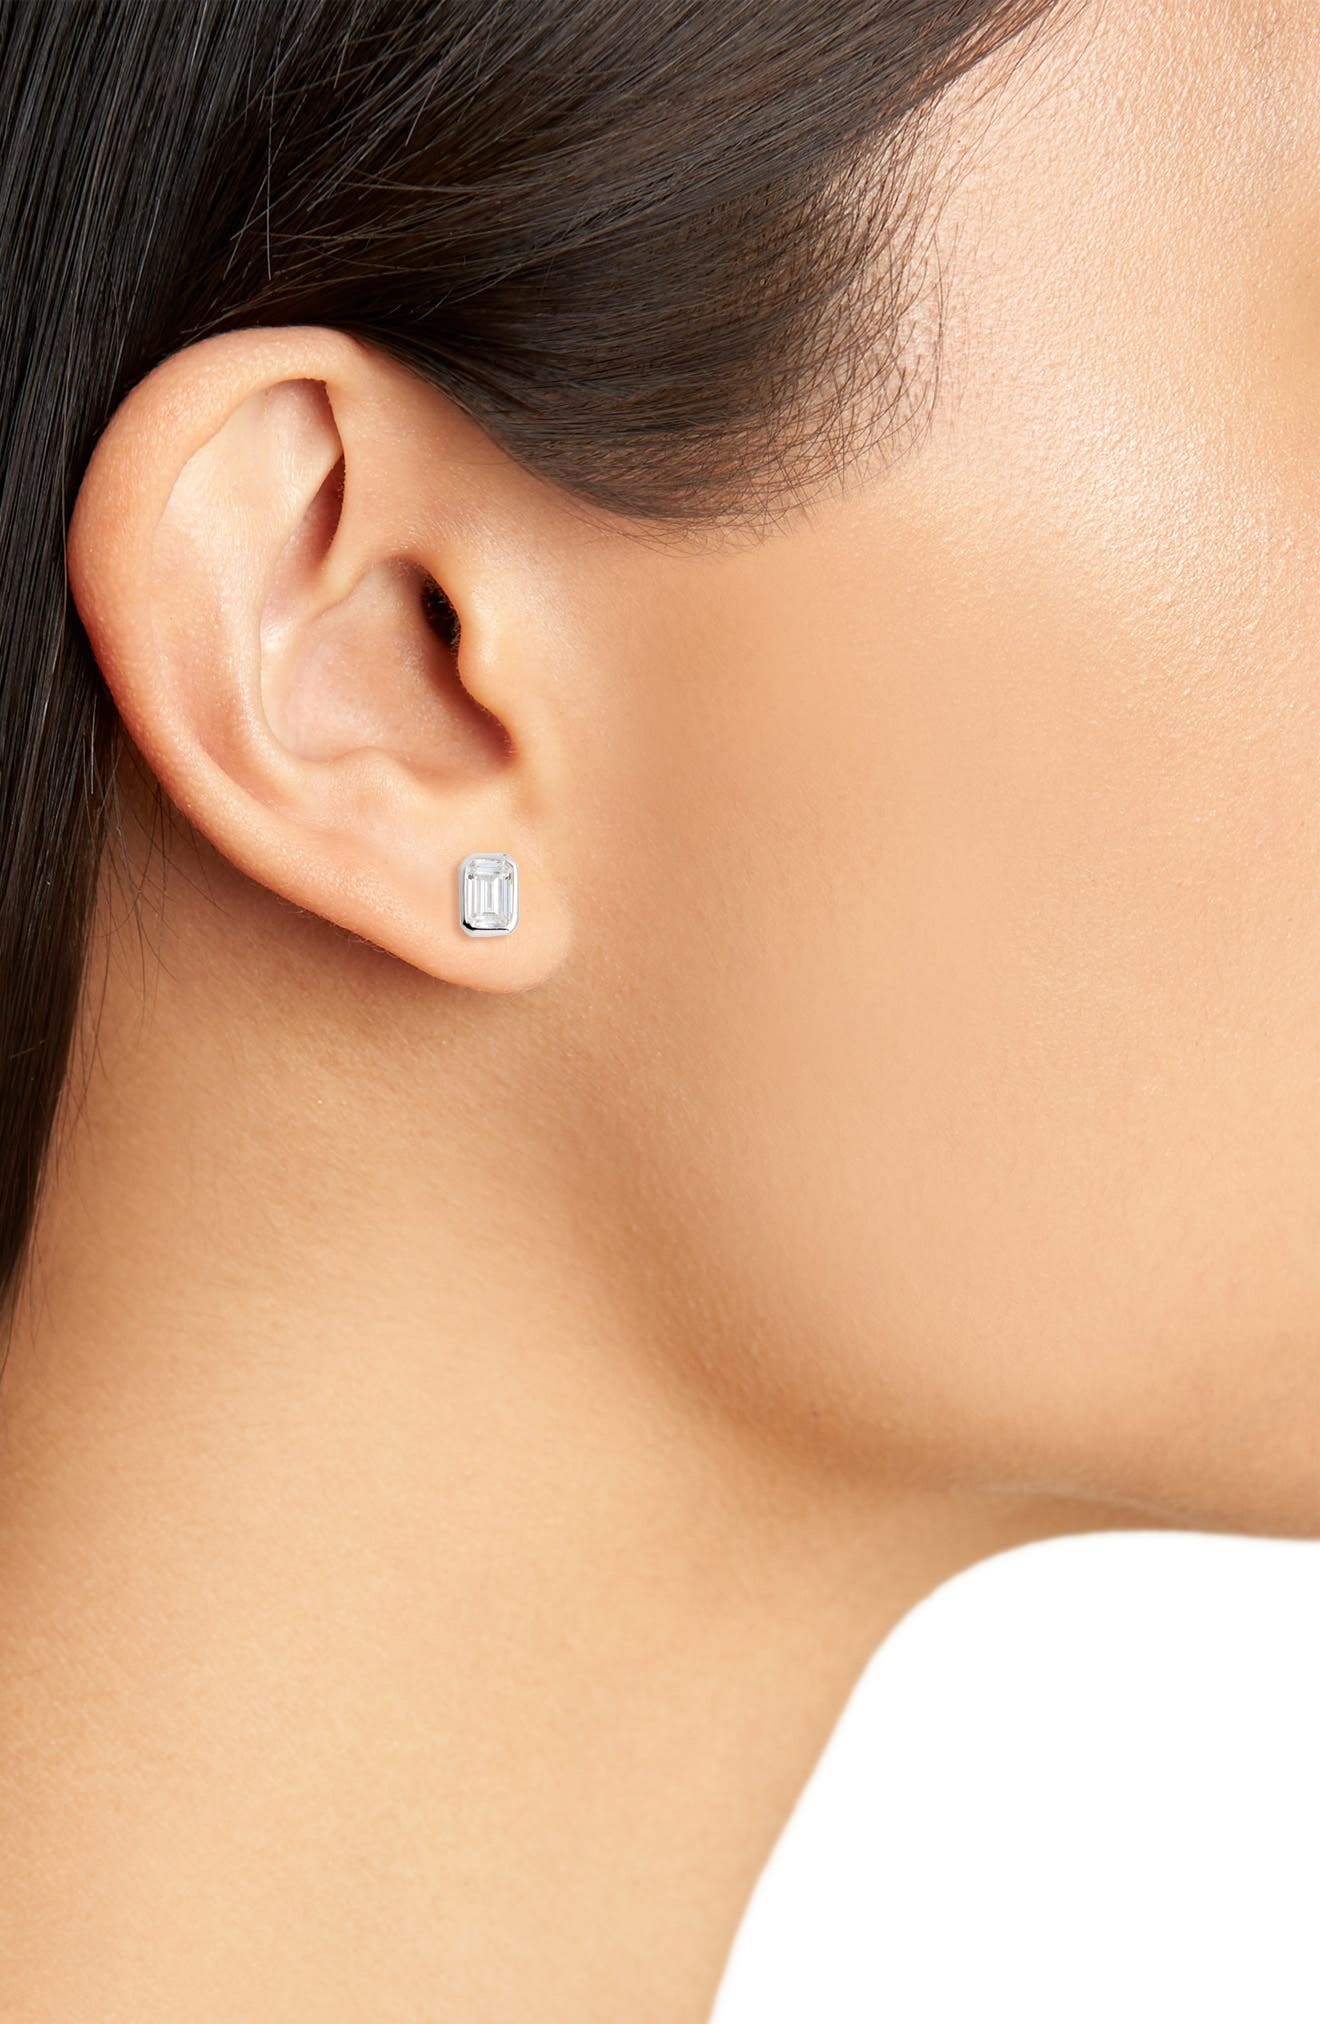 Bezel-Set Emerald Cut Stud Earrings,                             Alternate thumbnail 2, color,                             040